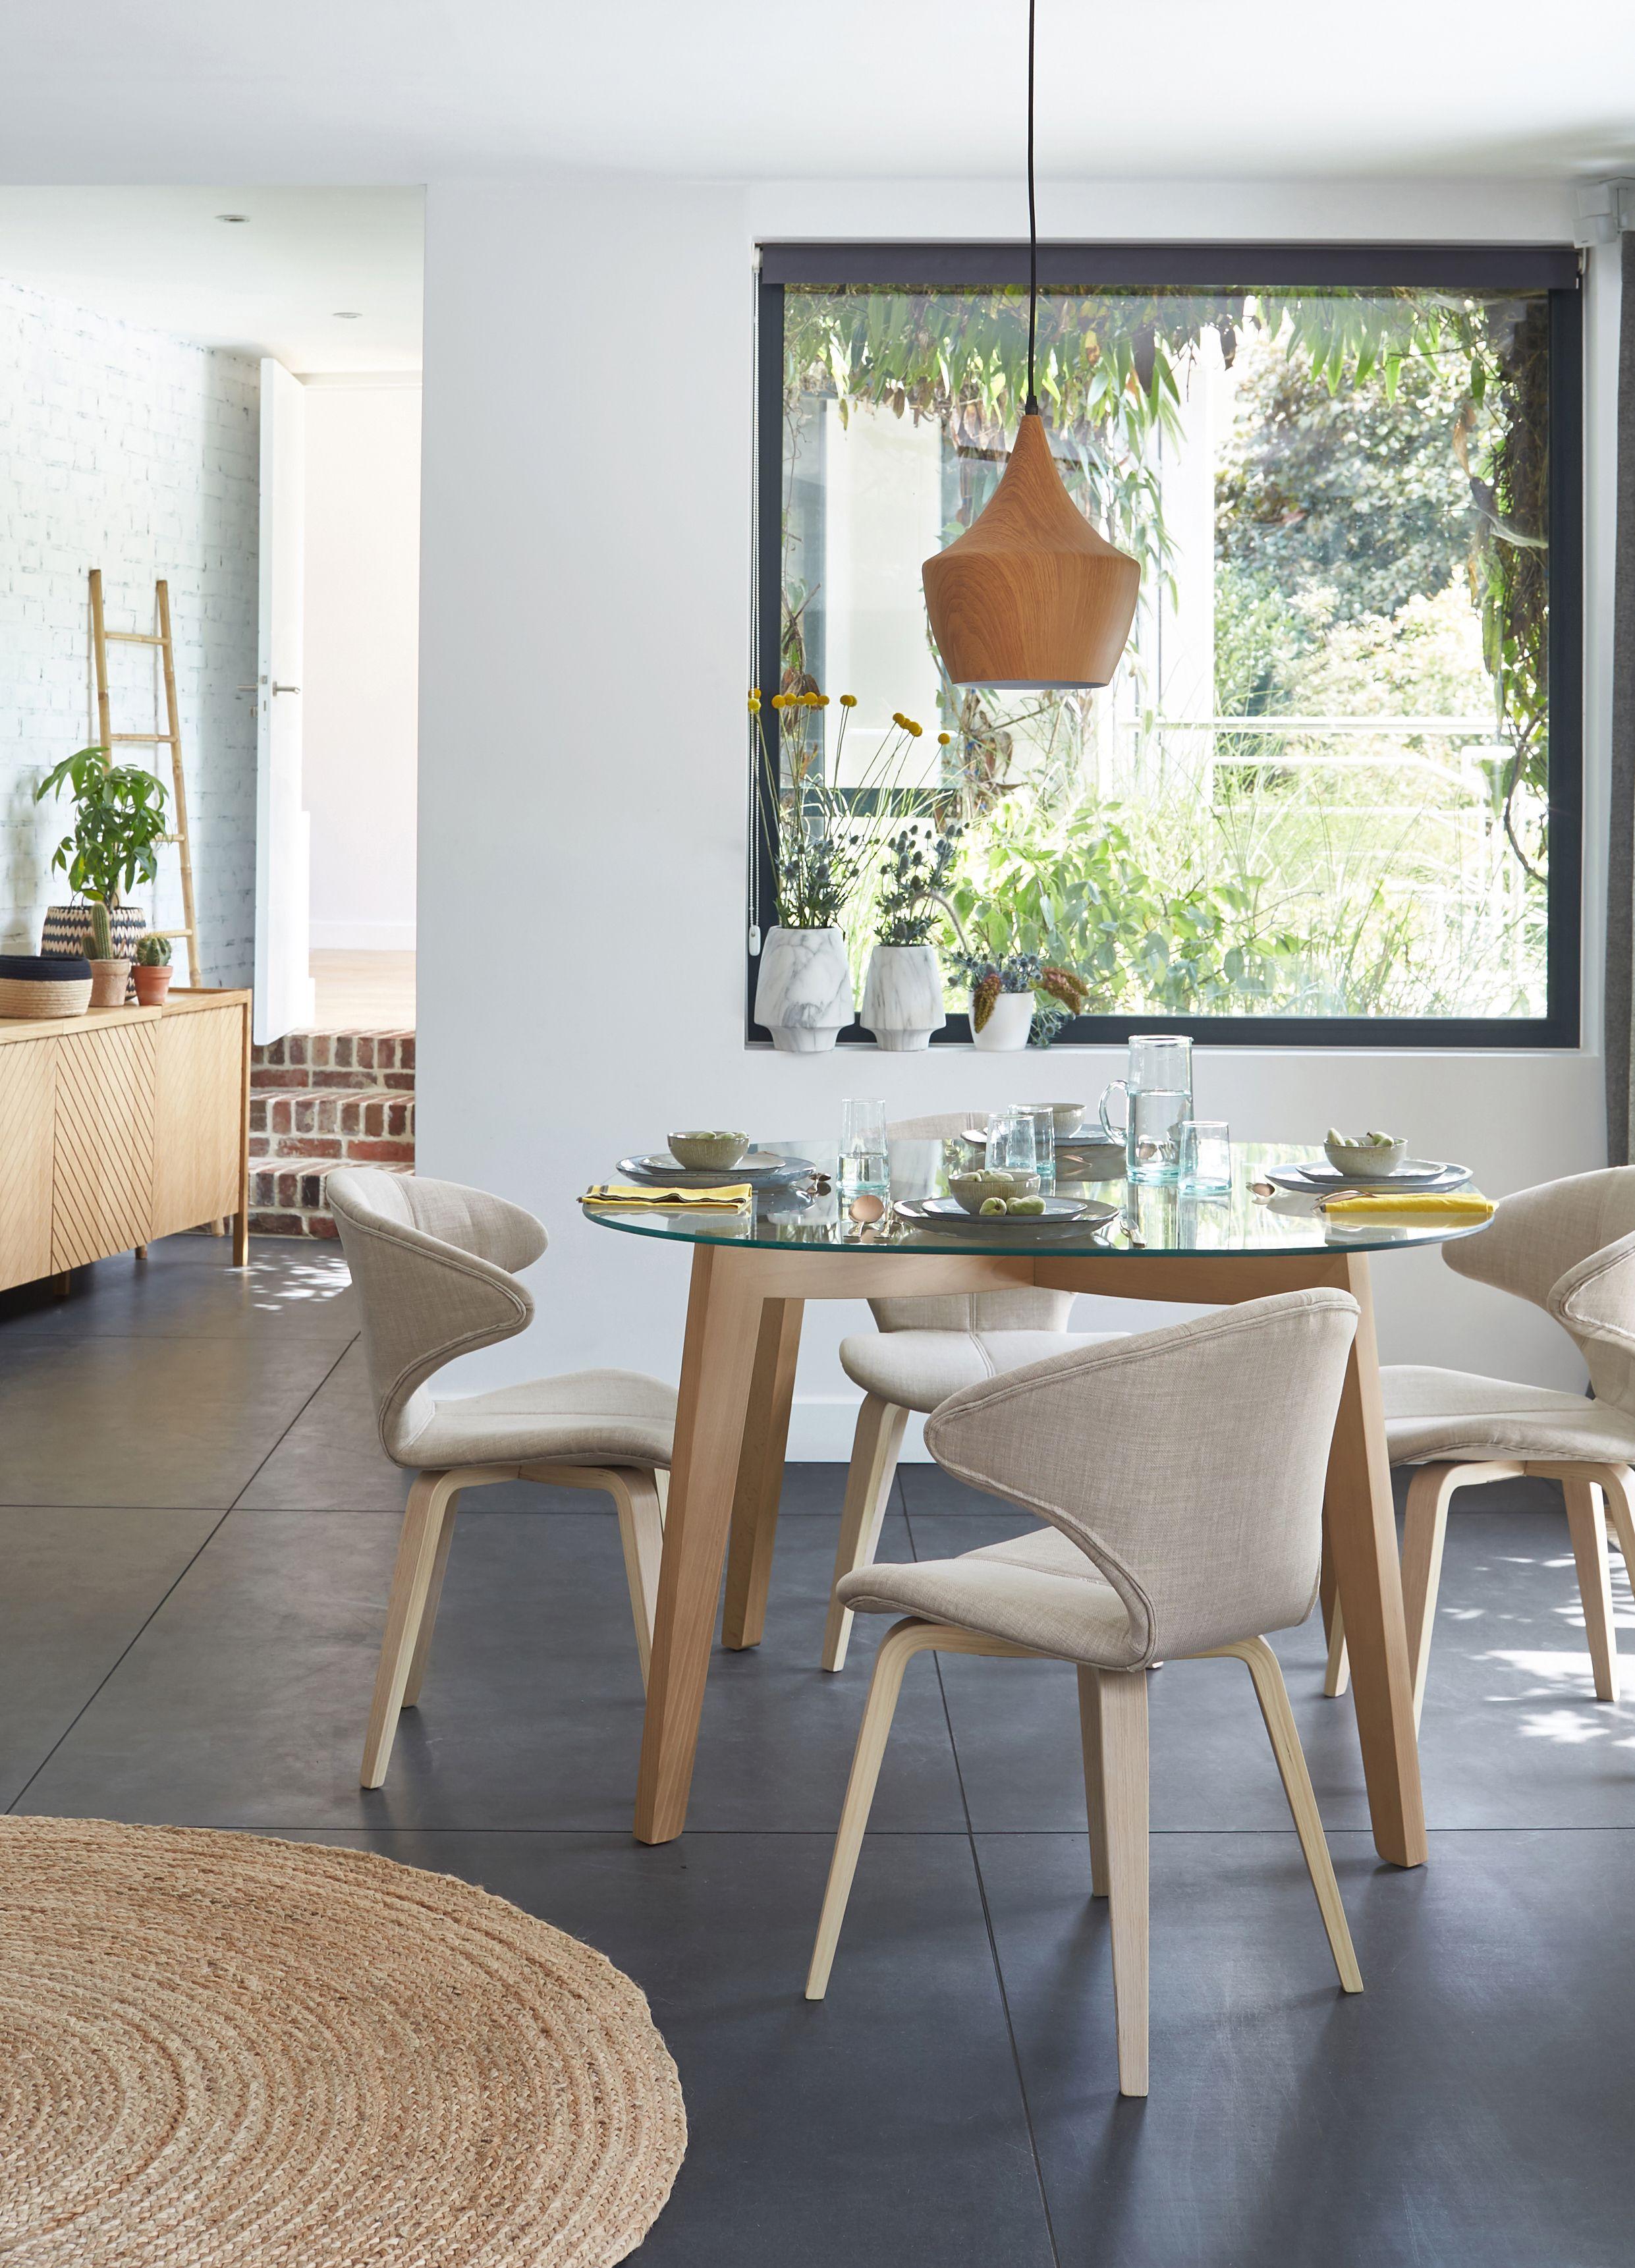 Jardin interieur tendance d coration d co maison alin a salle manger pinterest - Jardin interieur maison ...